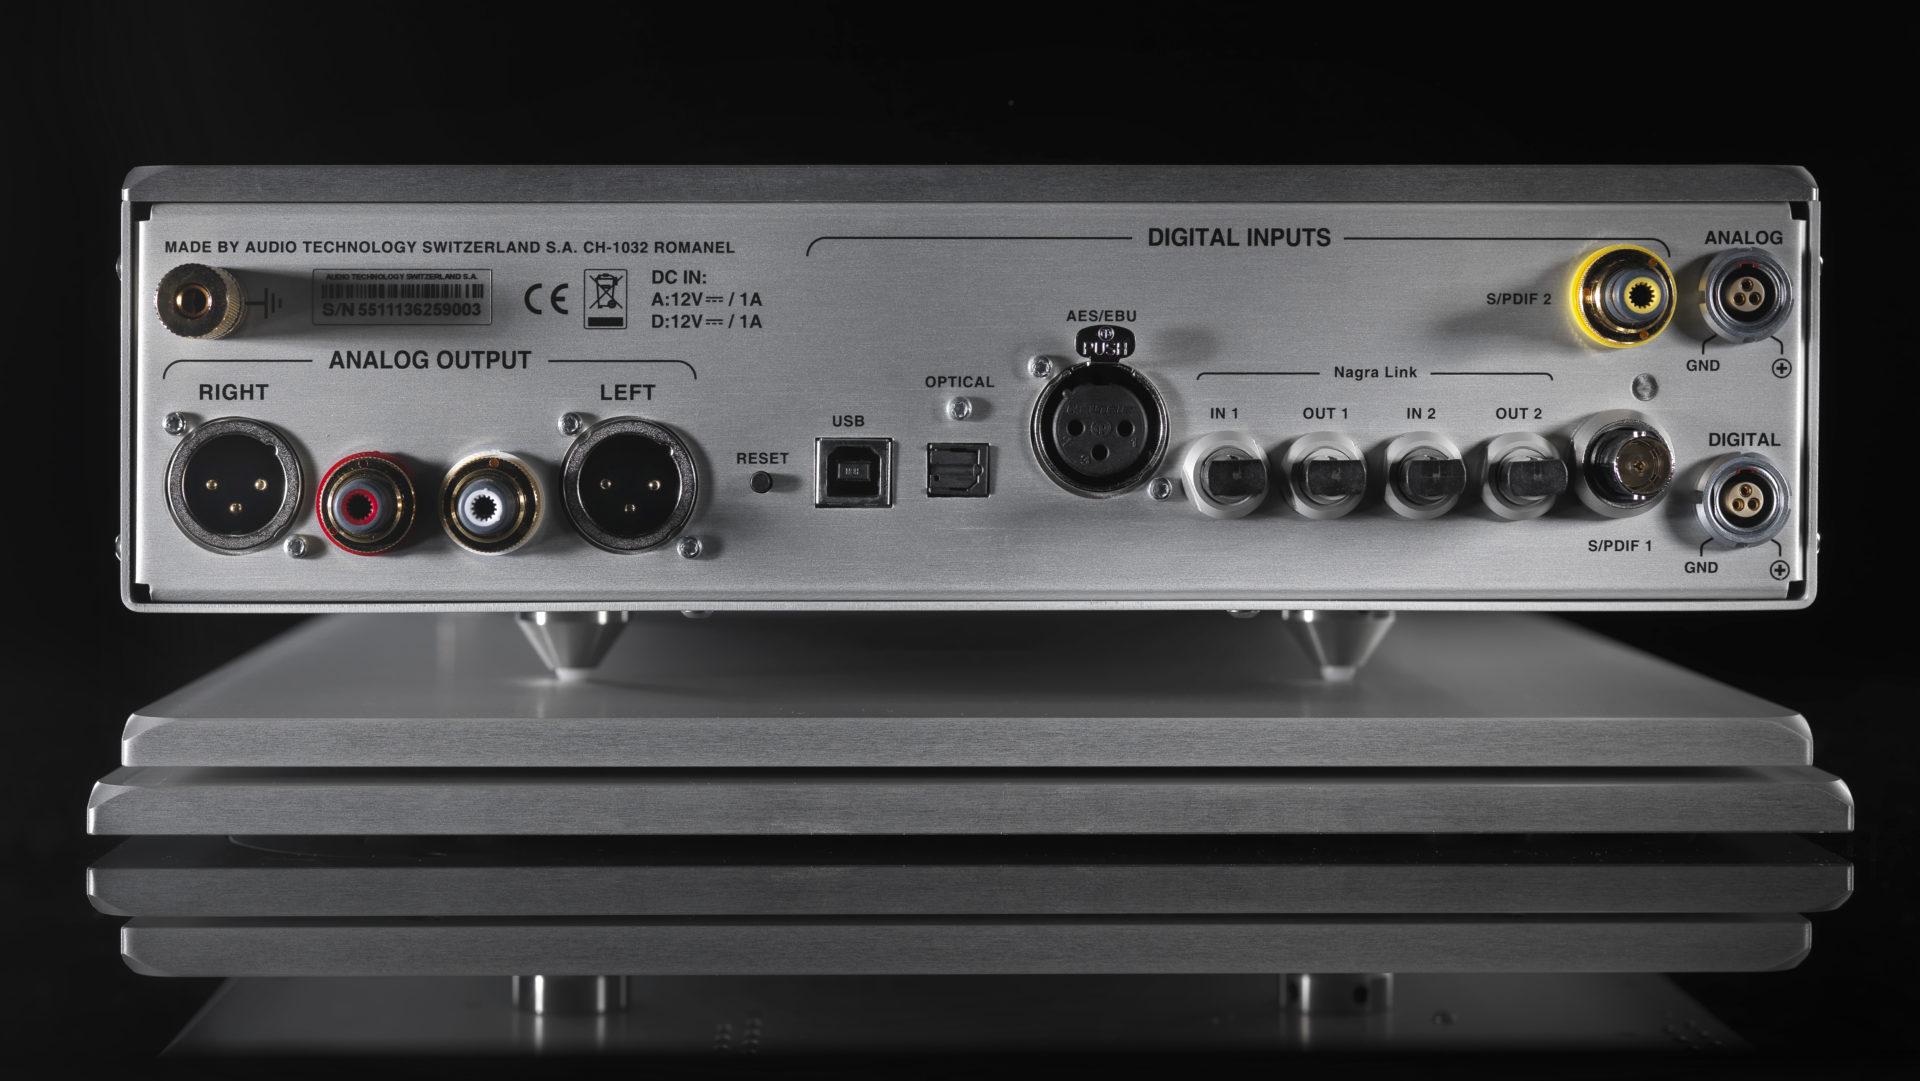 Nagra TUBE DAC digital to analog converter high end top best back inputs optical aes ebu s/pdifvfs